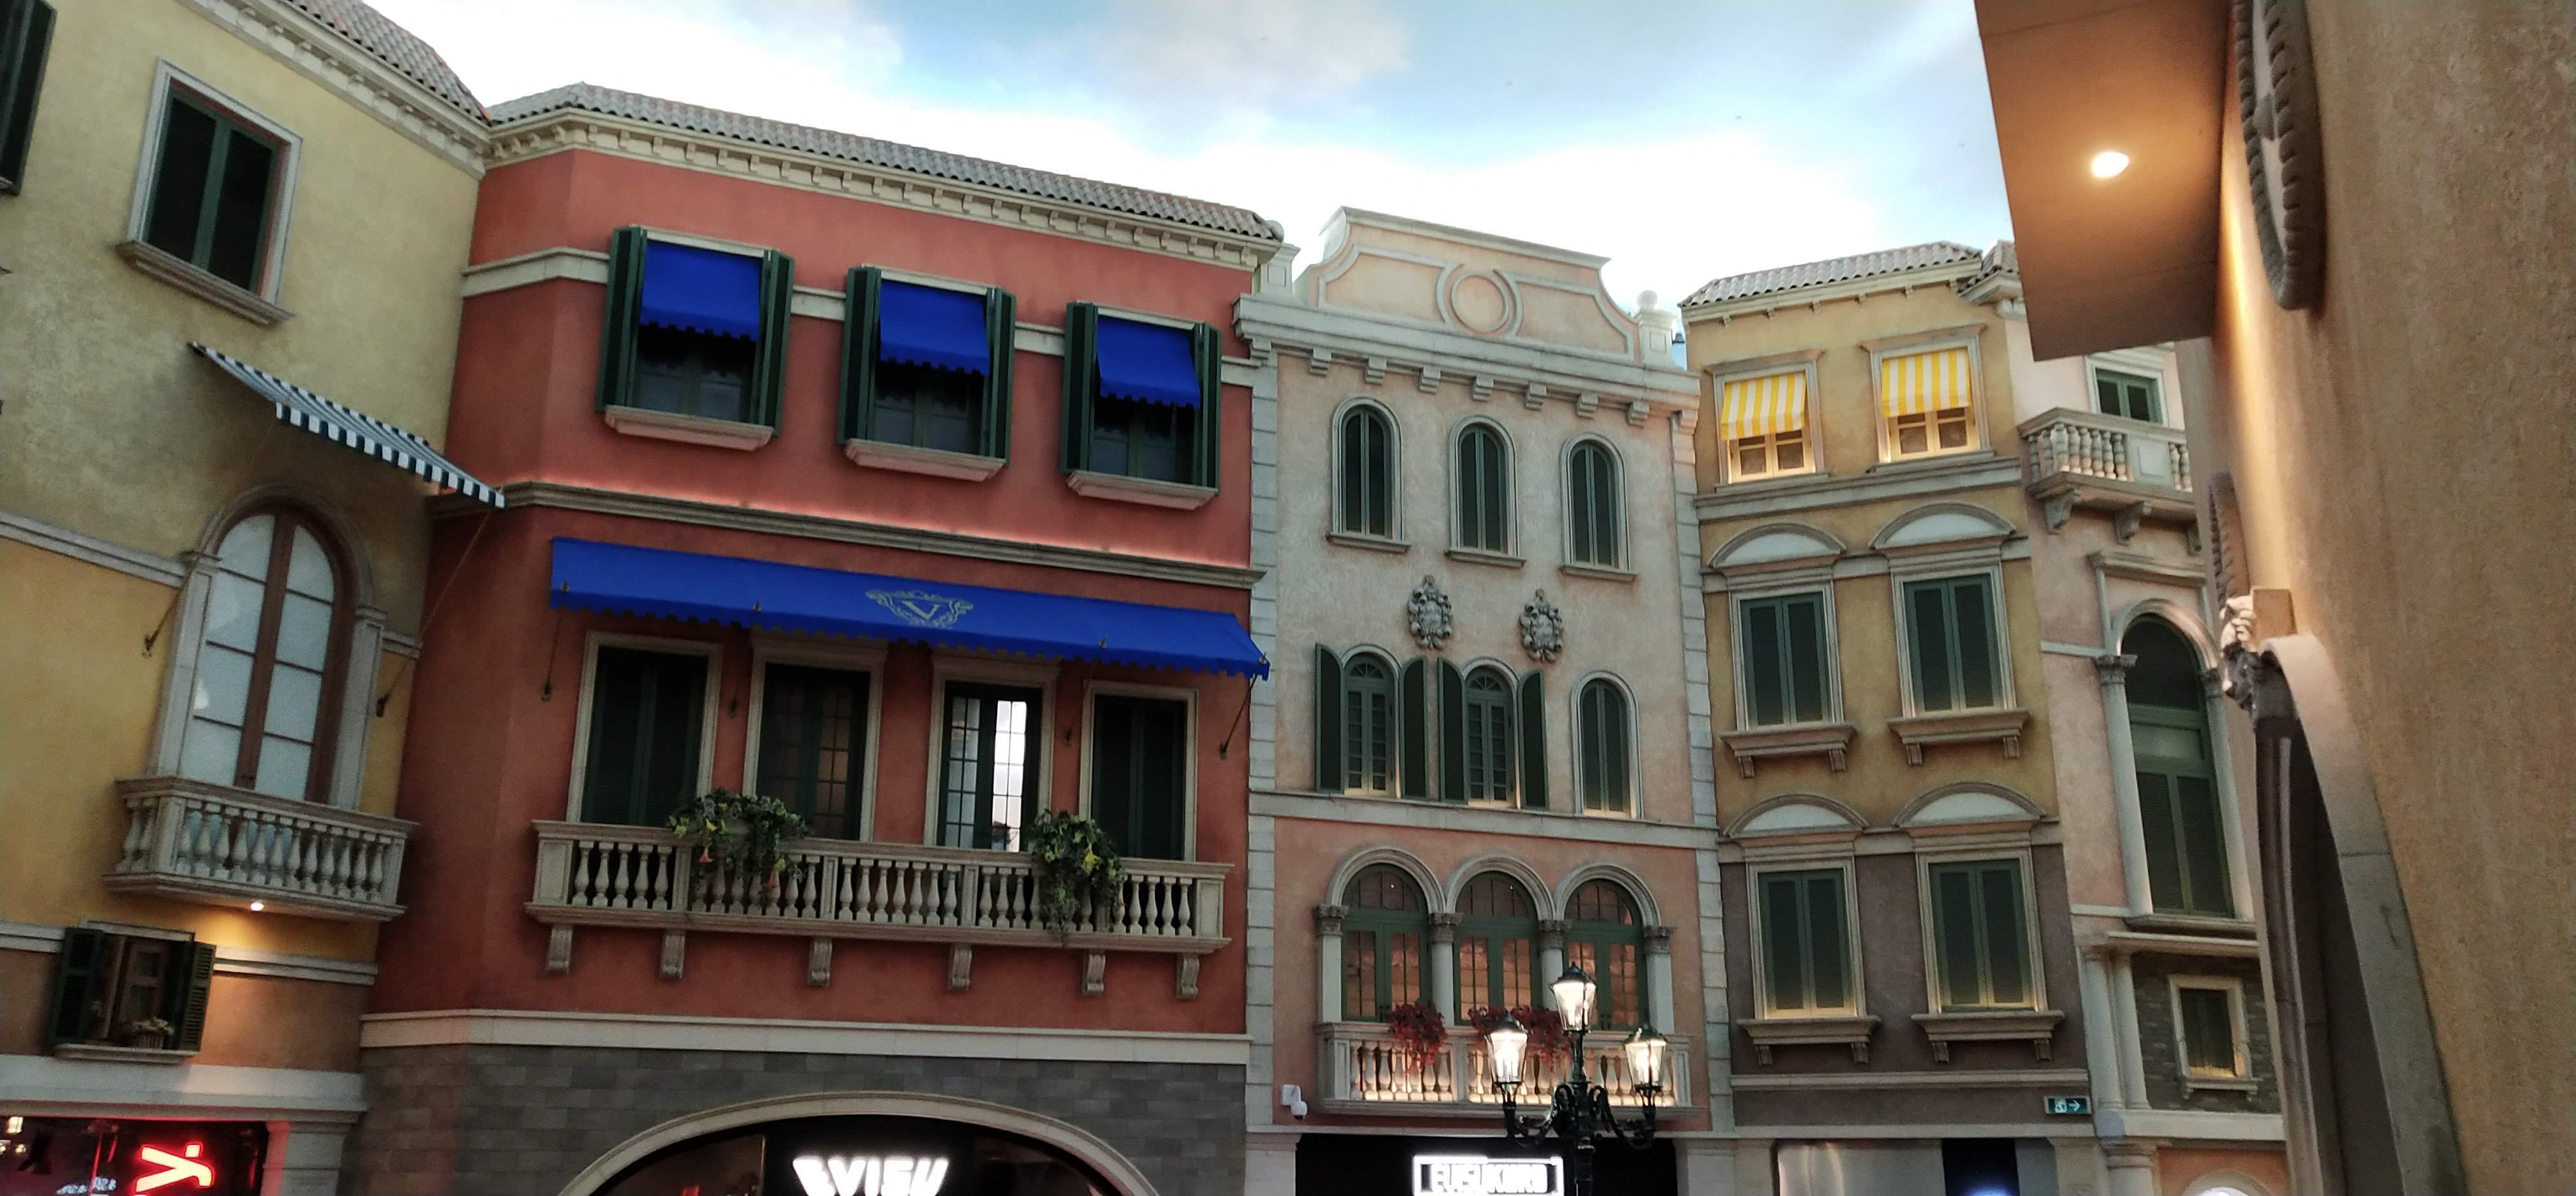 It is easy to get lost in the large Venetian Macau